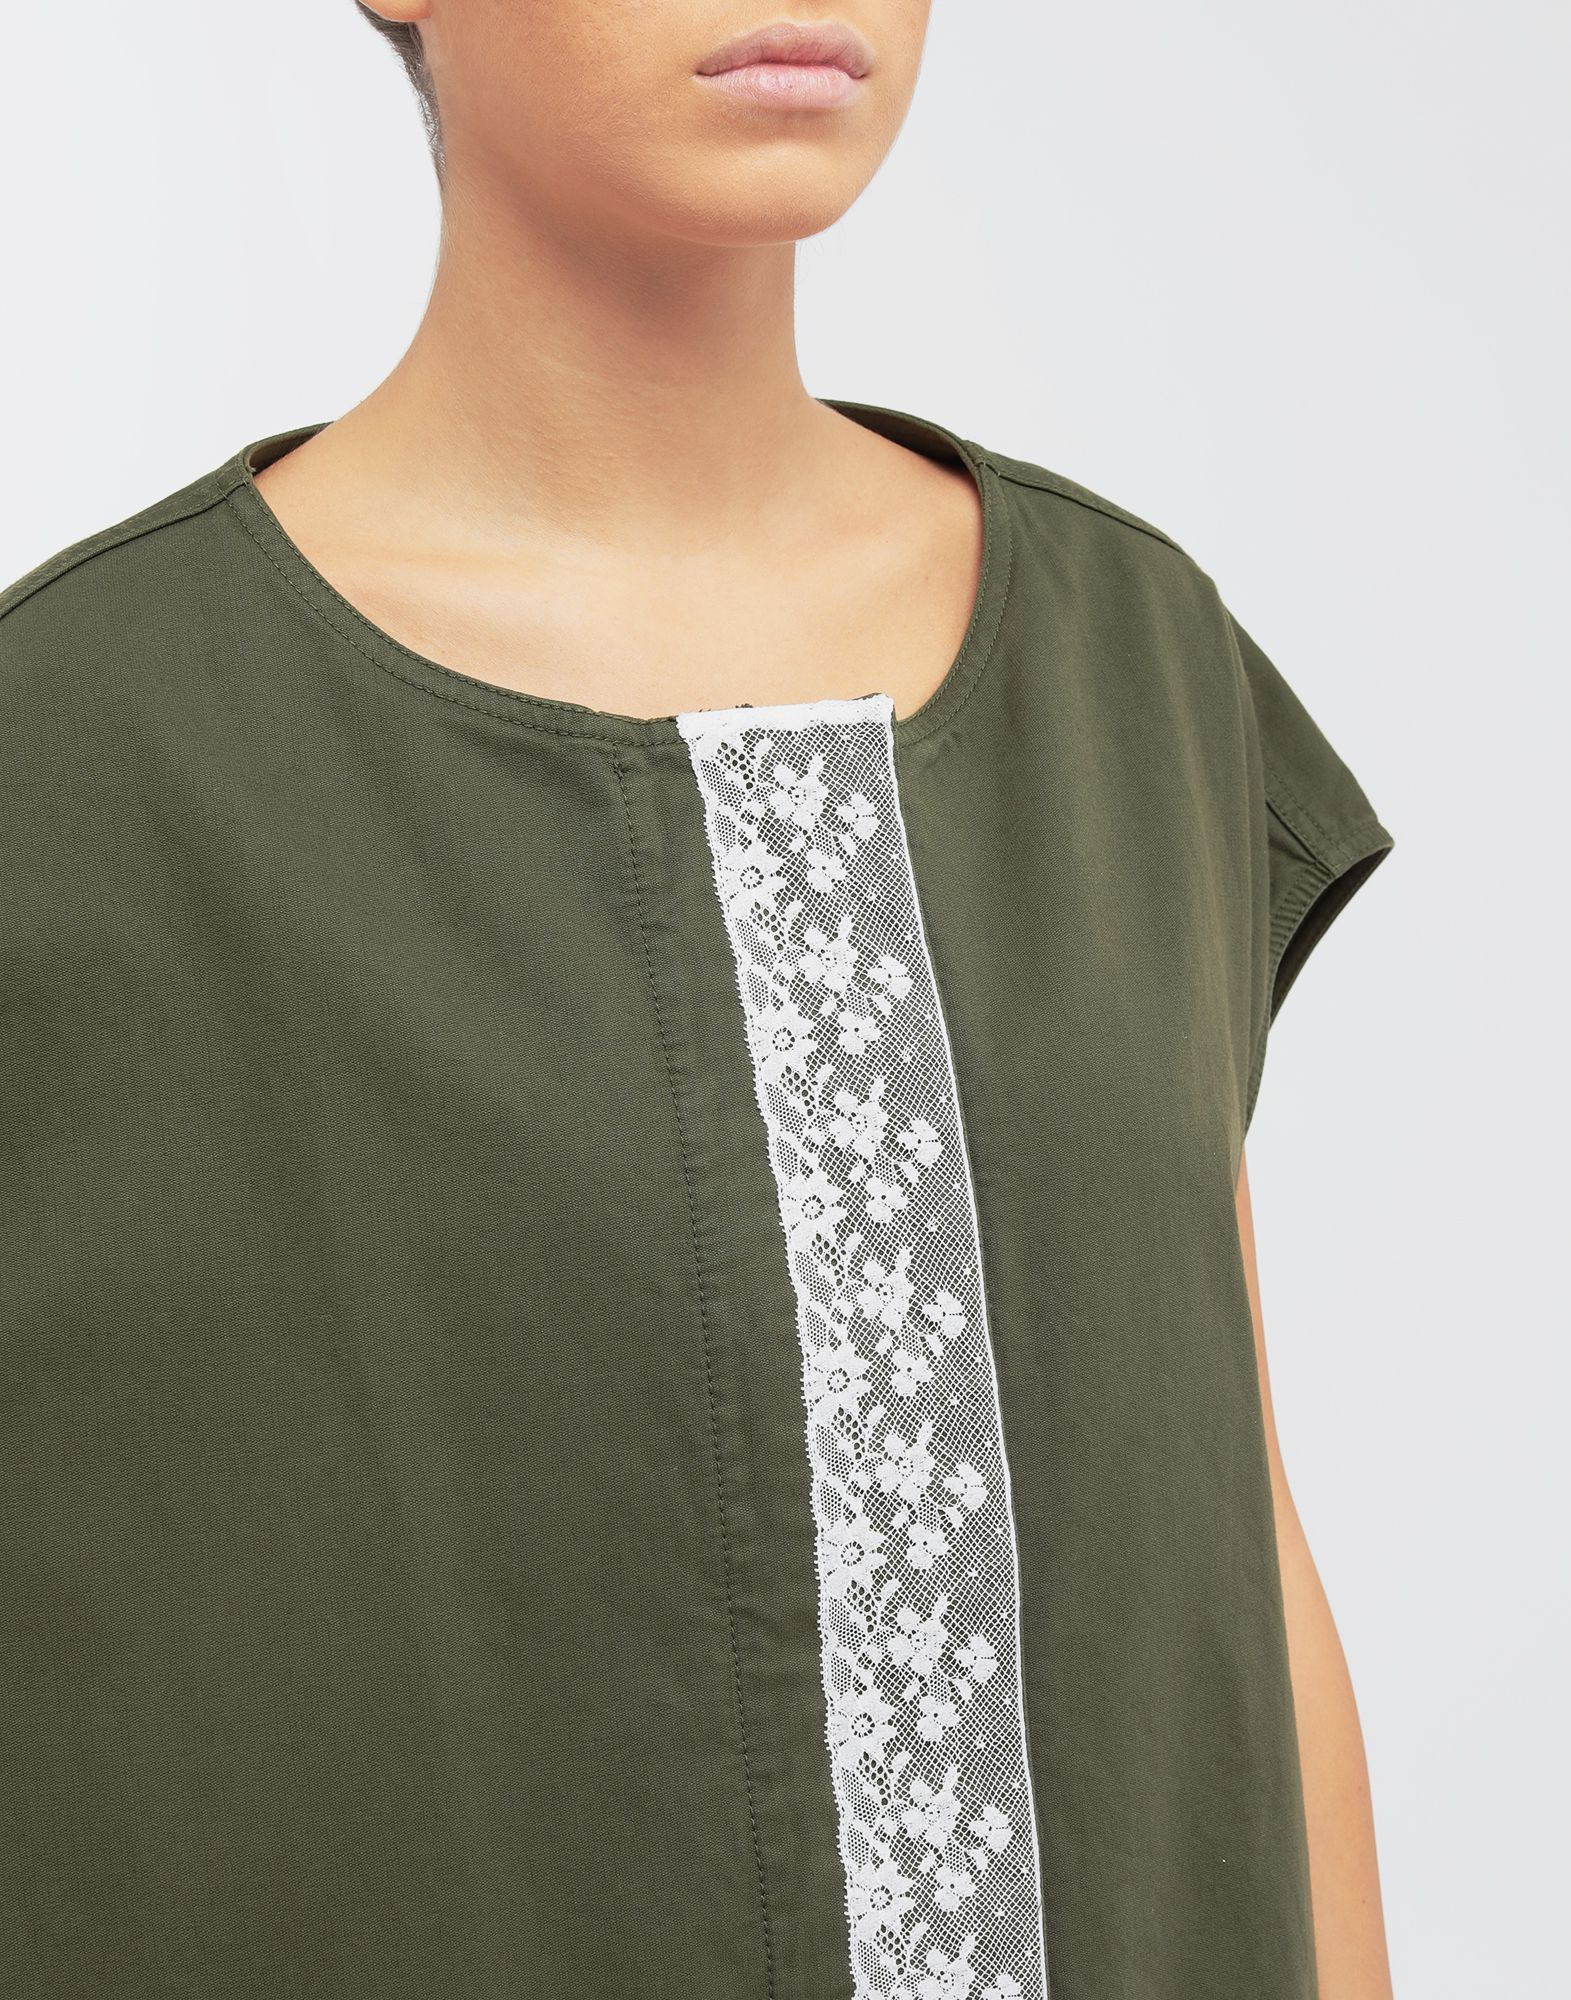 MM6 MAISON MARGIELA Oversized lace-trimmed dress Short dress Woman a